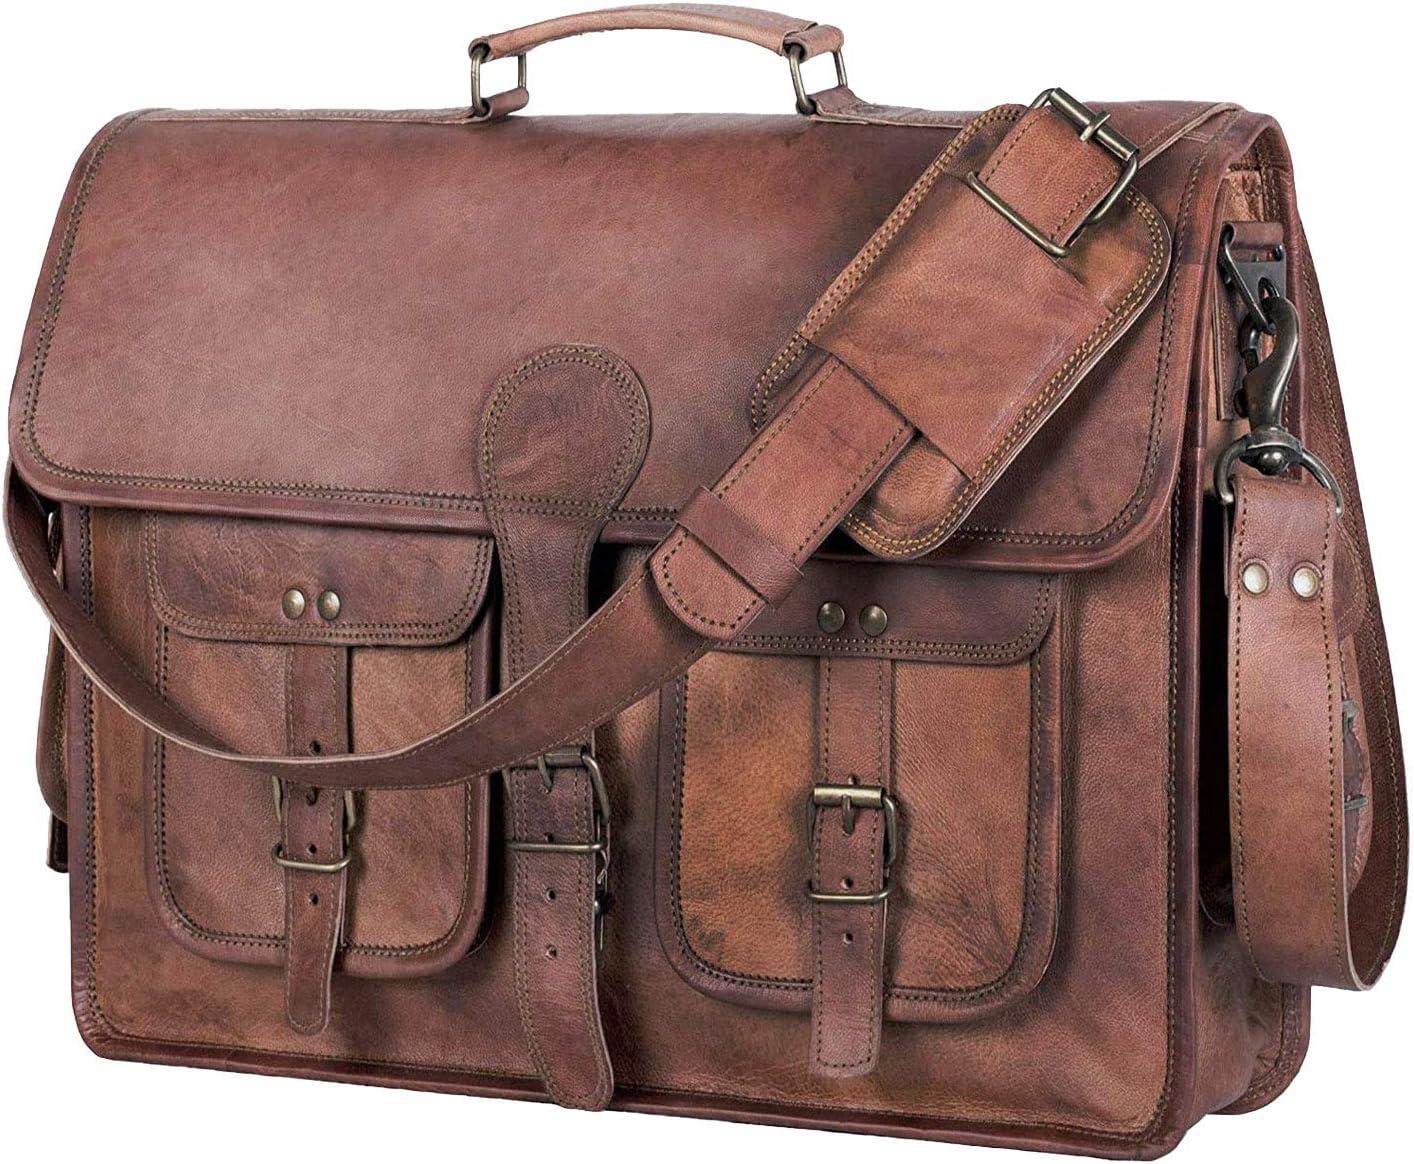 Heathbold Incanto 13 Macbook laptop etc Personalisation monogram option Large Classic handmade brown leather satchel bag messenger tote